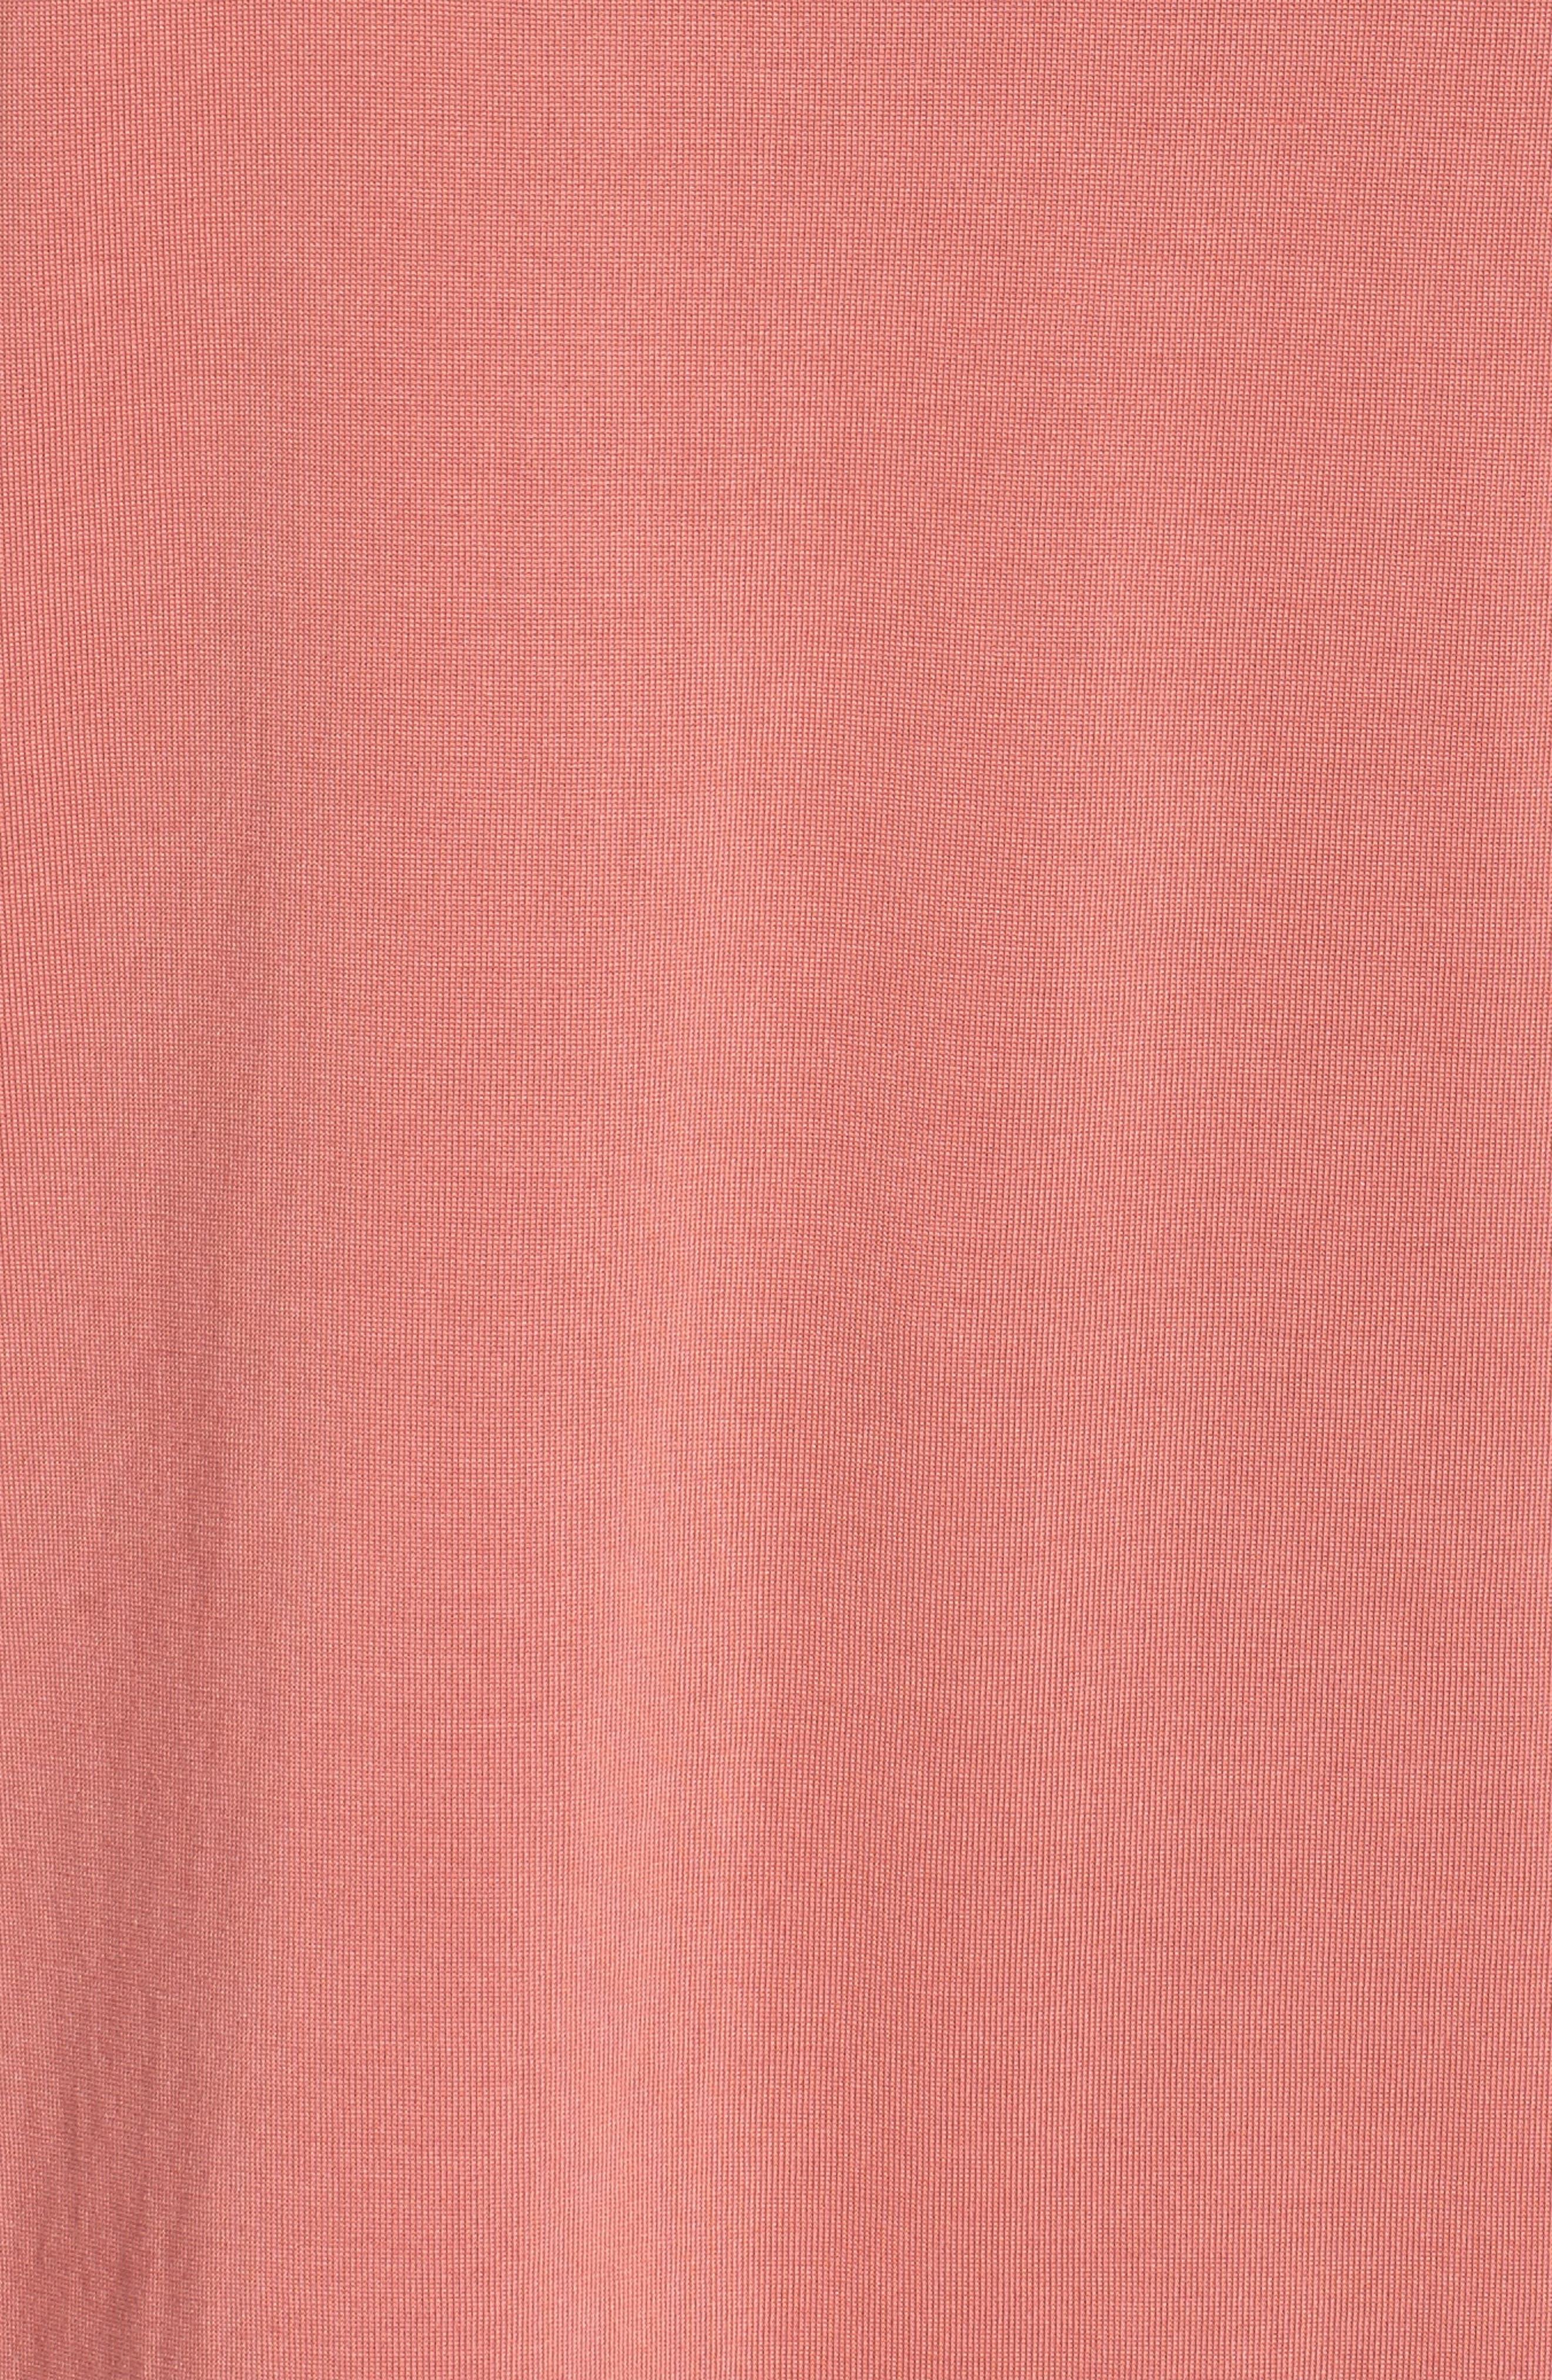 Cutout Sleeve Tee,                             Alternate thumbnail 18, color,